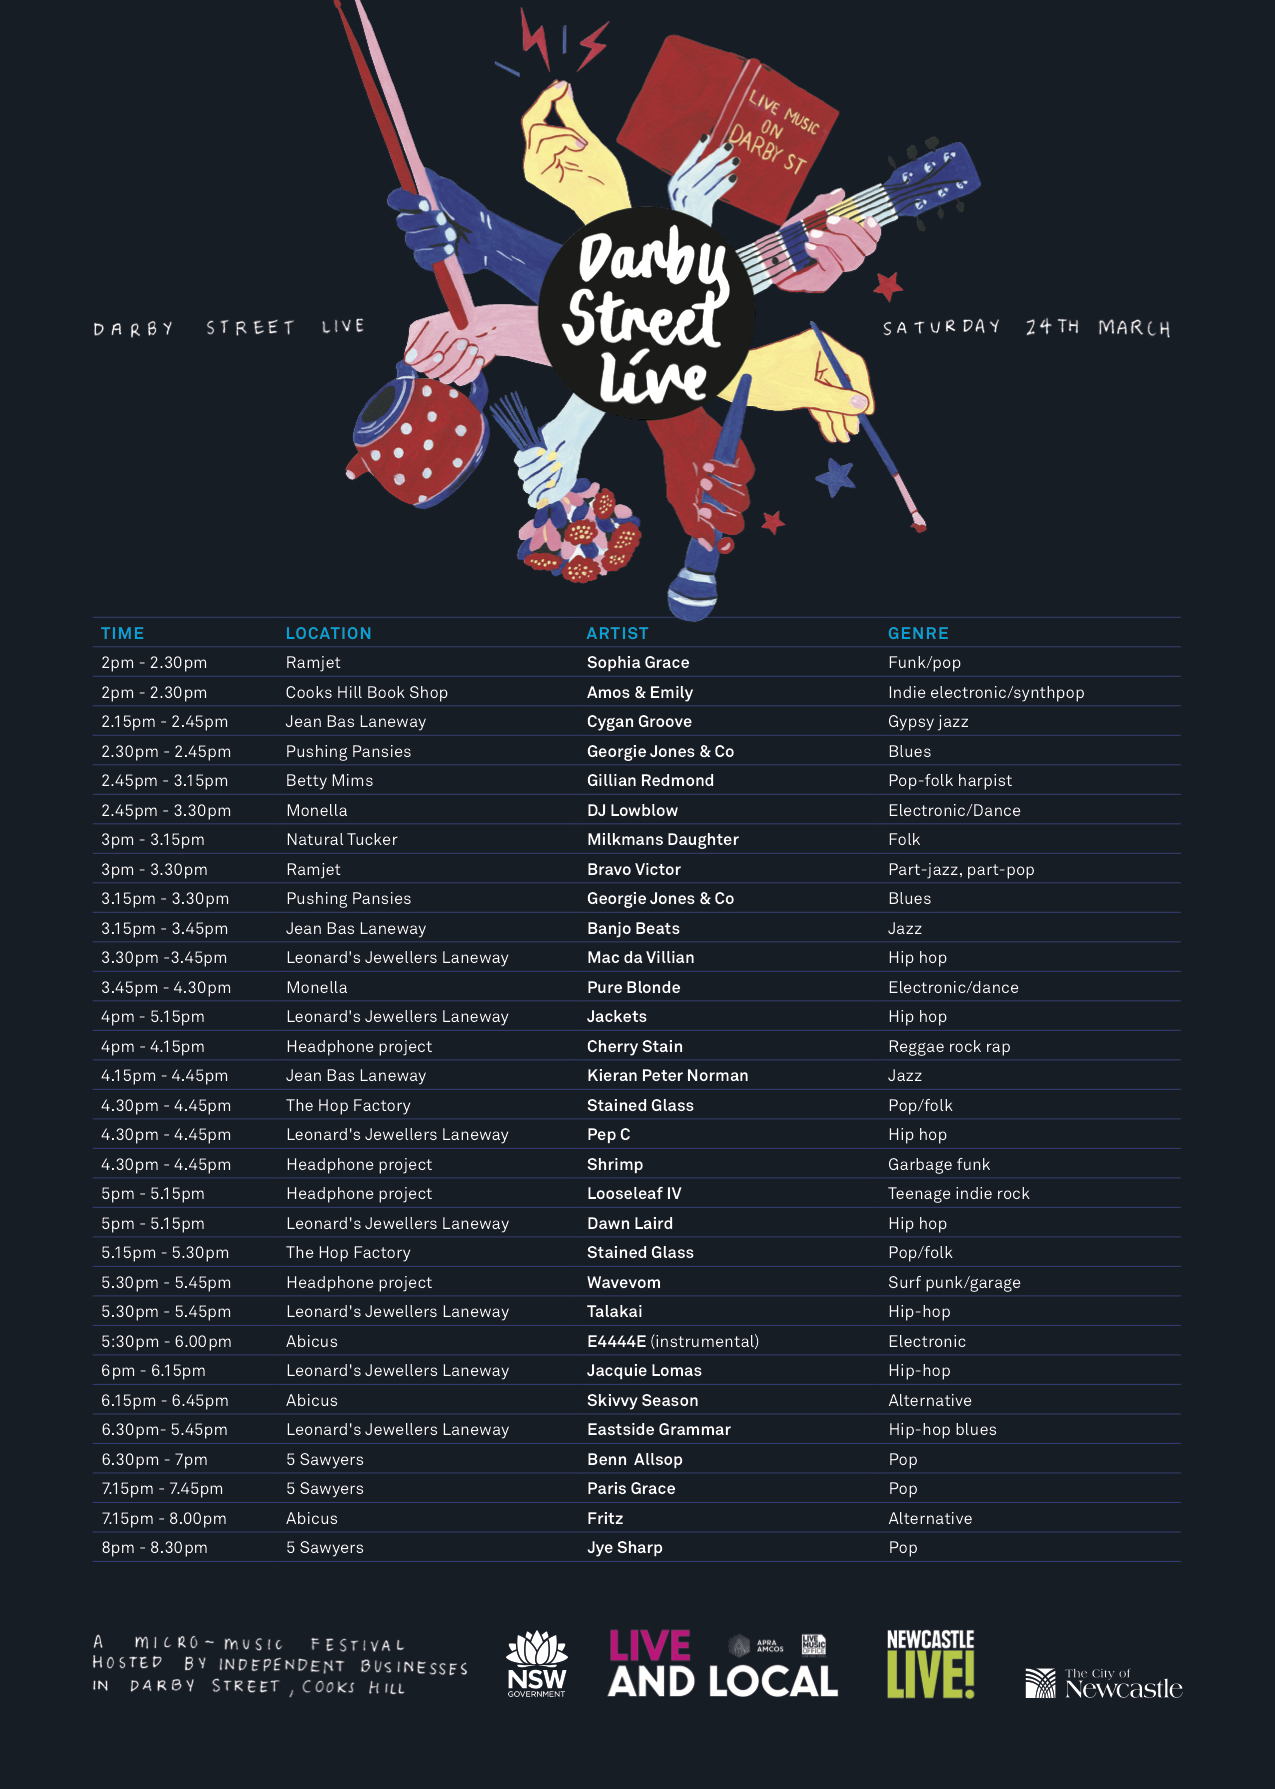 Darby+Street+Live+lineup.jpg